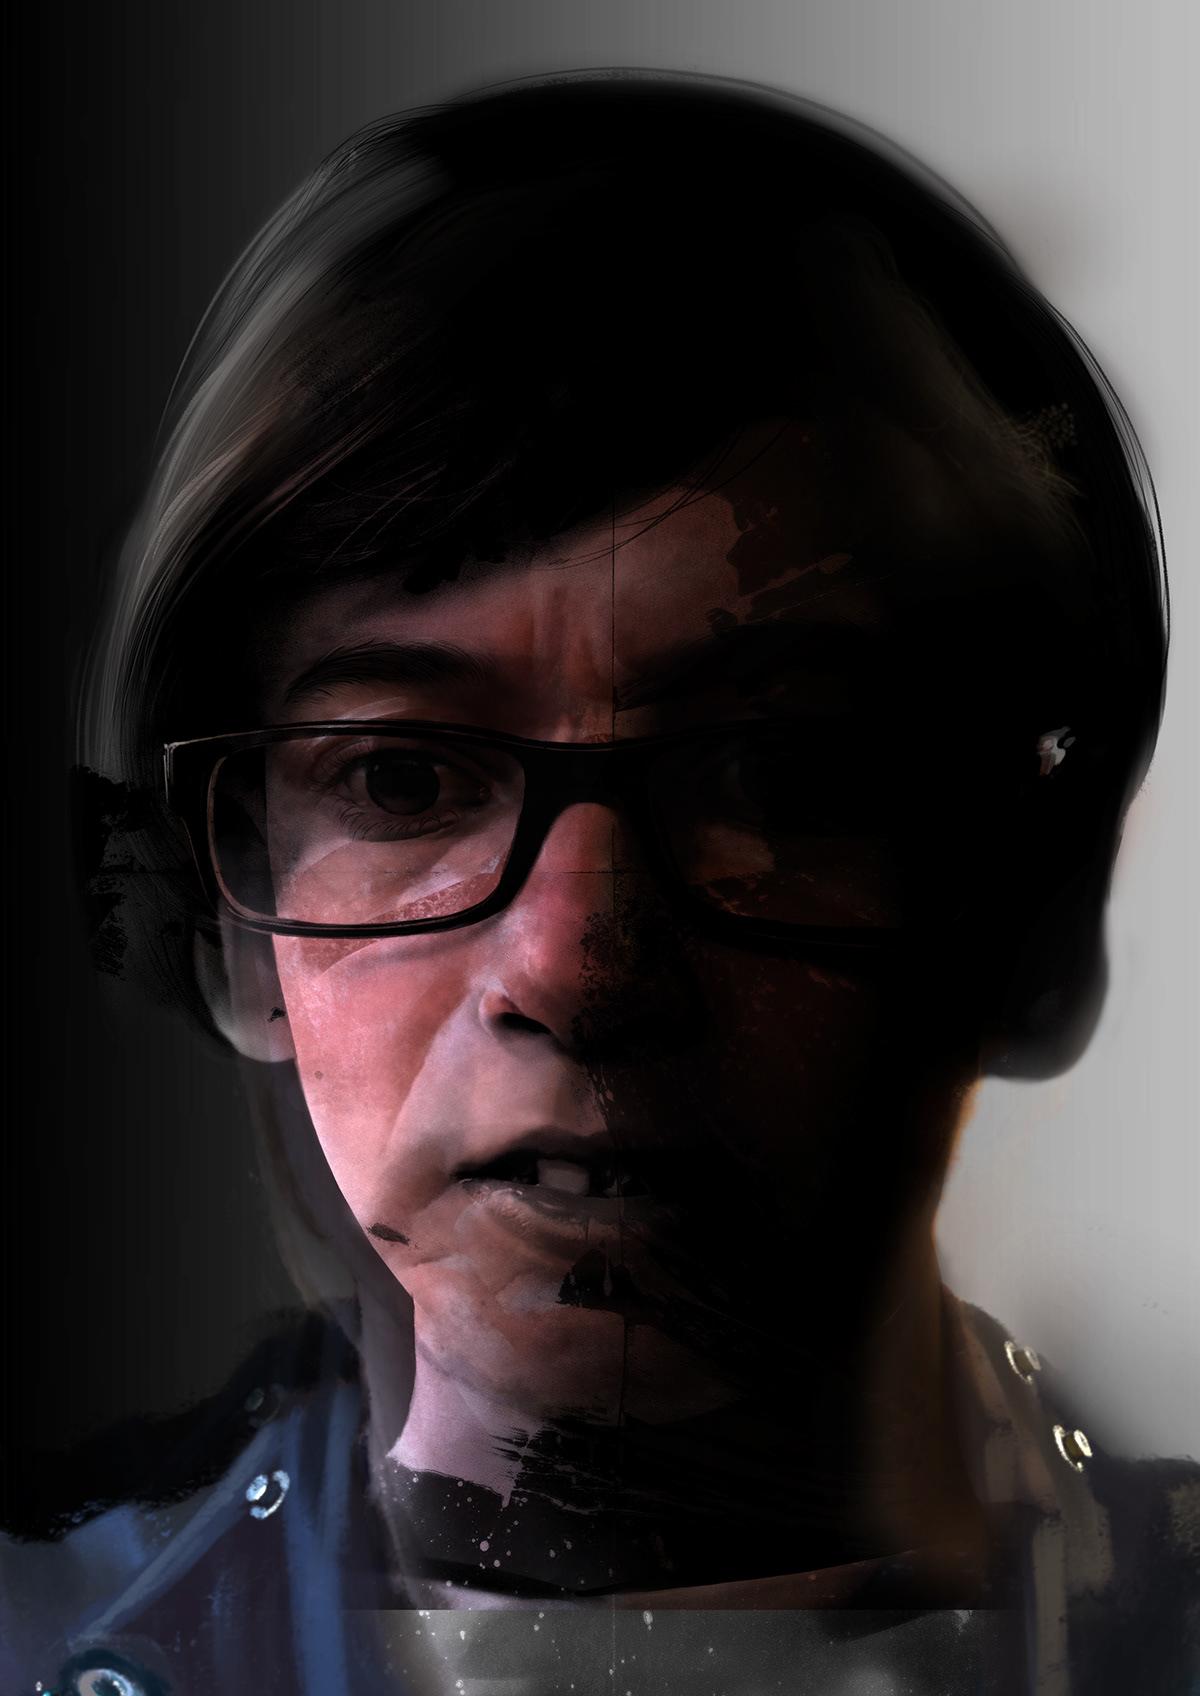 portrait Realism Digital Art  mobile art digital painting